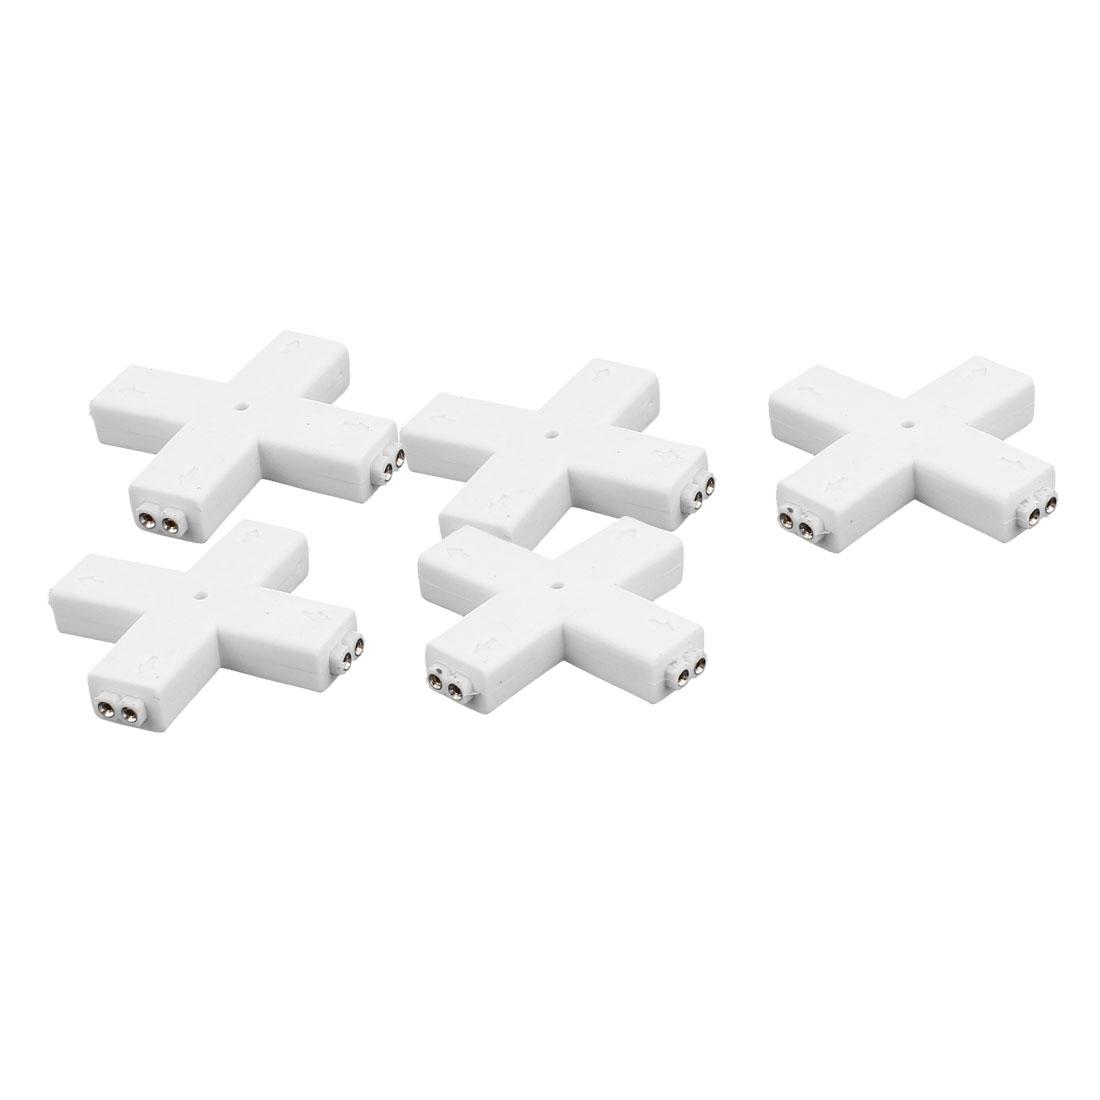 5 Pcs Cross Shape 4 Way 2P Female Connector White for 3528 RGB Led Strip Light